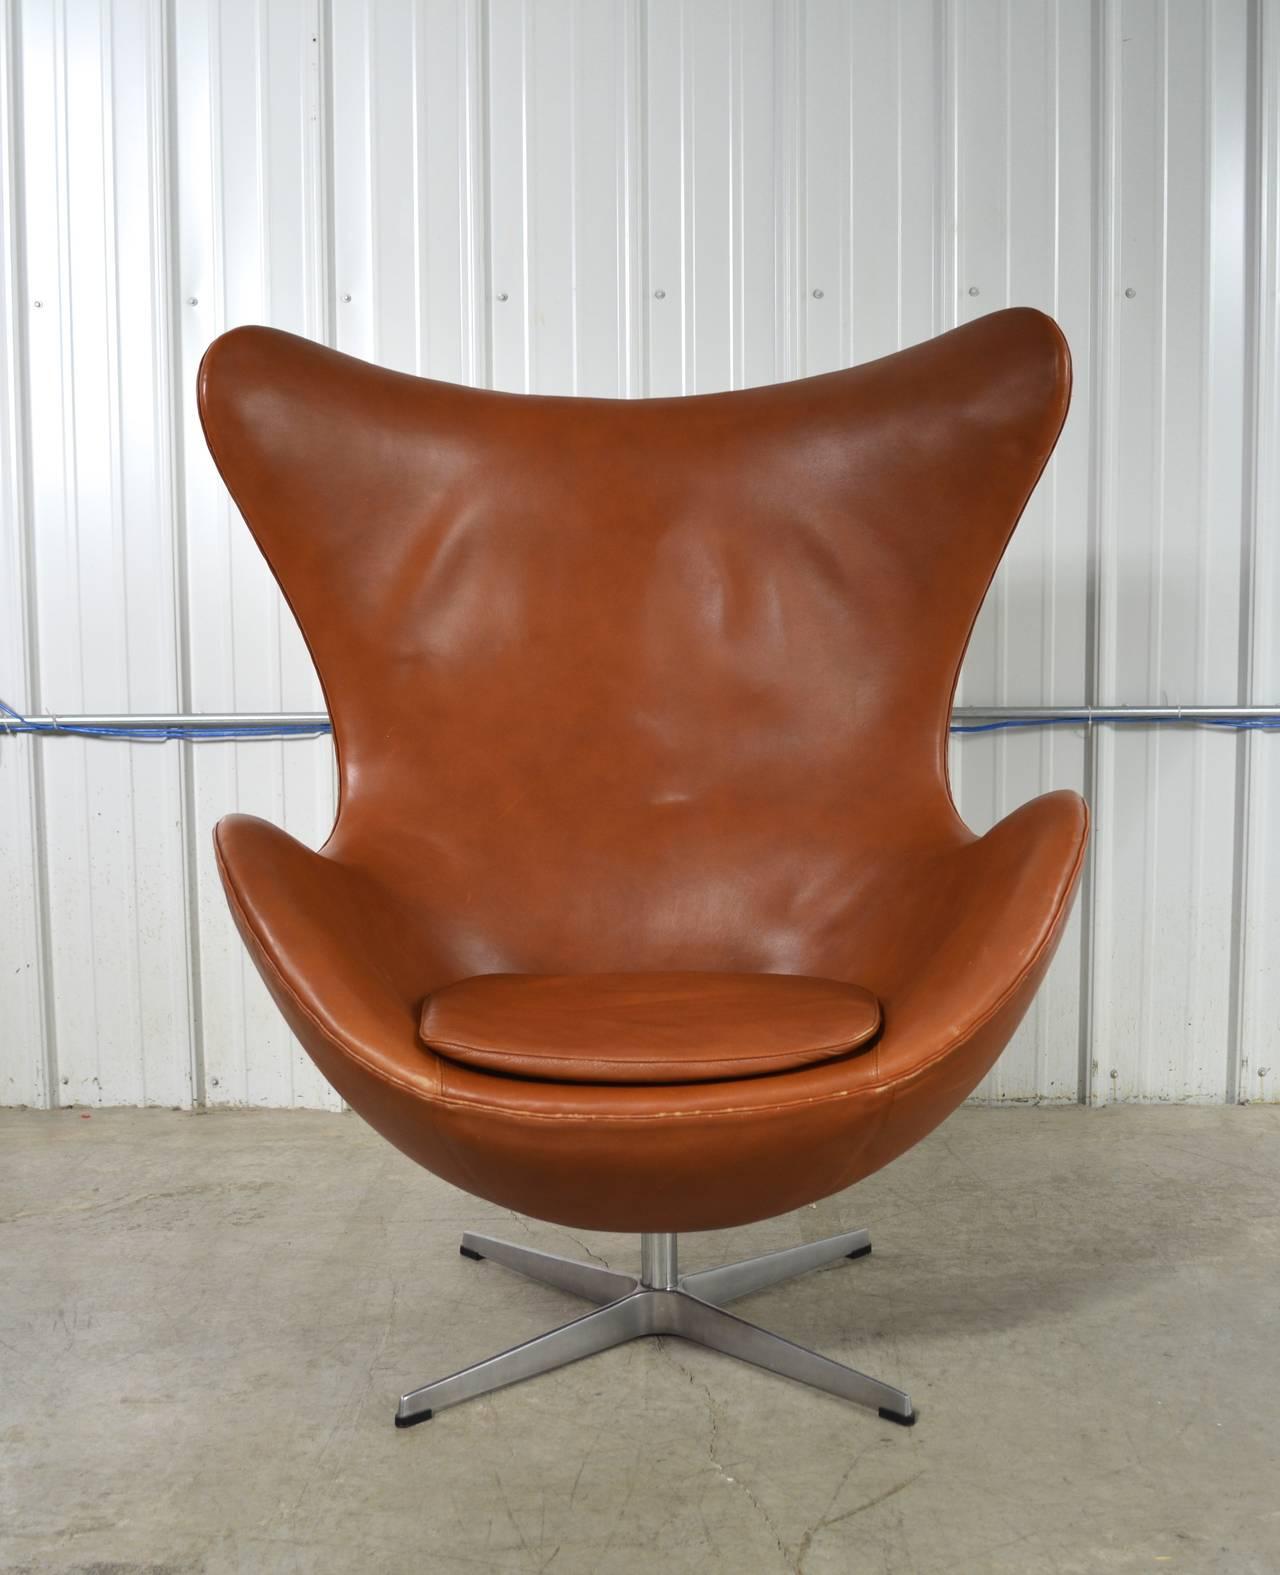 arne jacobsen egg chair and ottoman for sale at 1stdibs. Black Bedroom Furniture Sets. Home Design Ideas